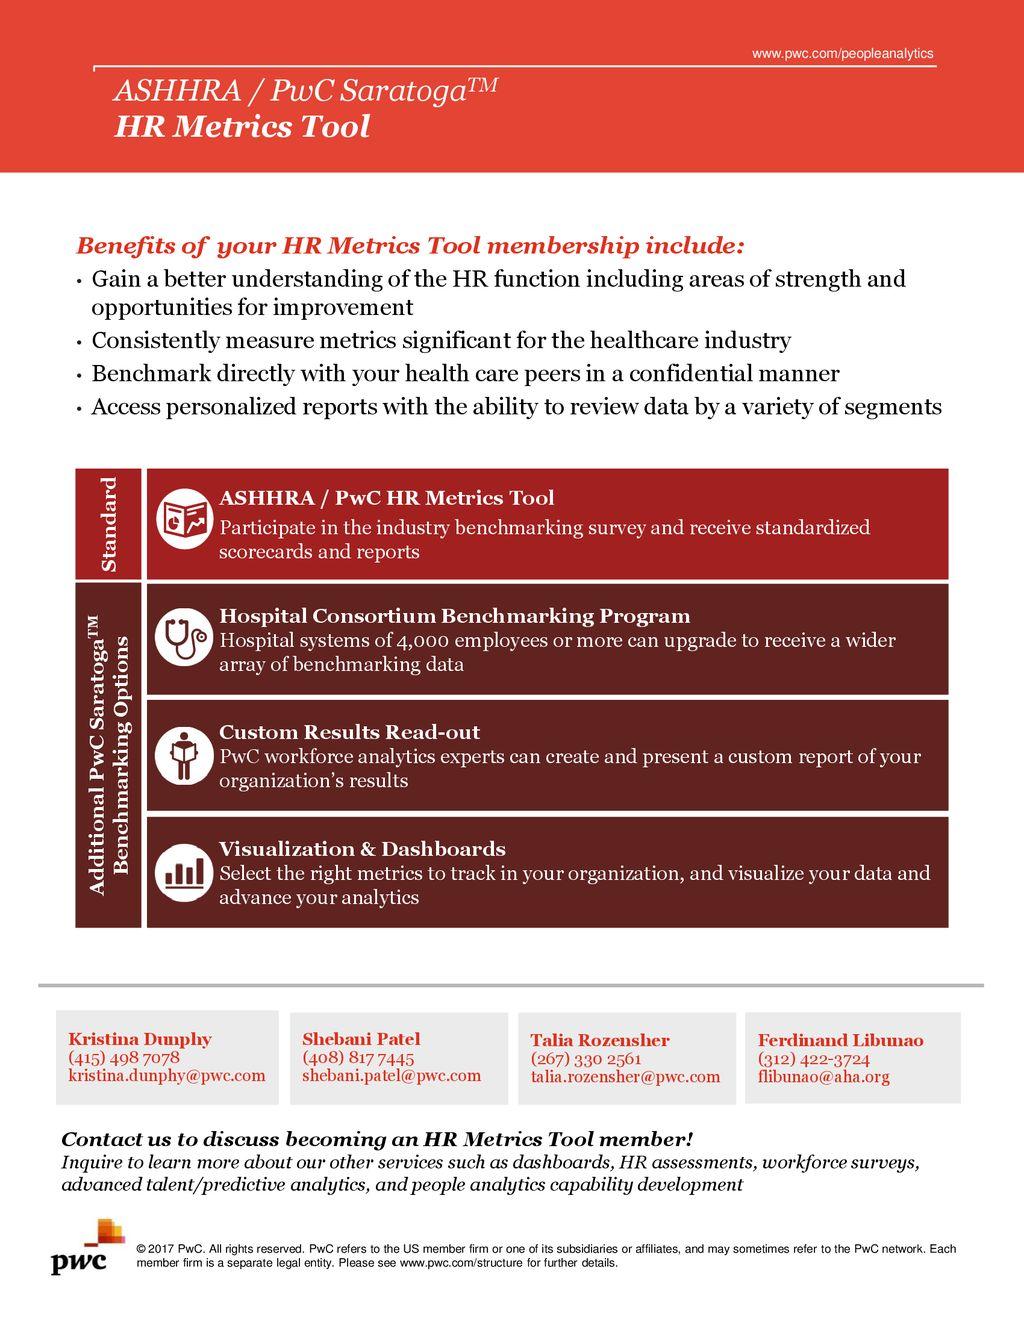 ASHHRA / PwC SaratogaTM HR Metrics Tool - ppt download